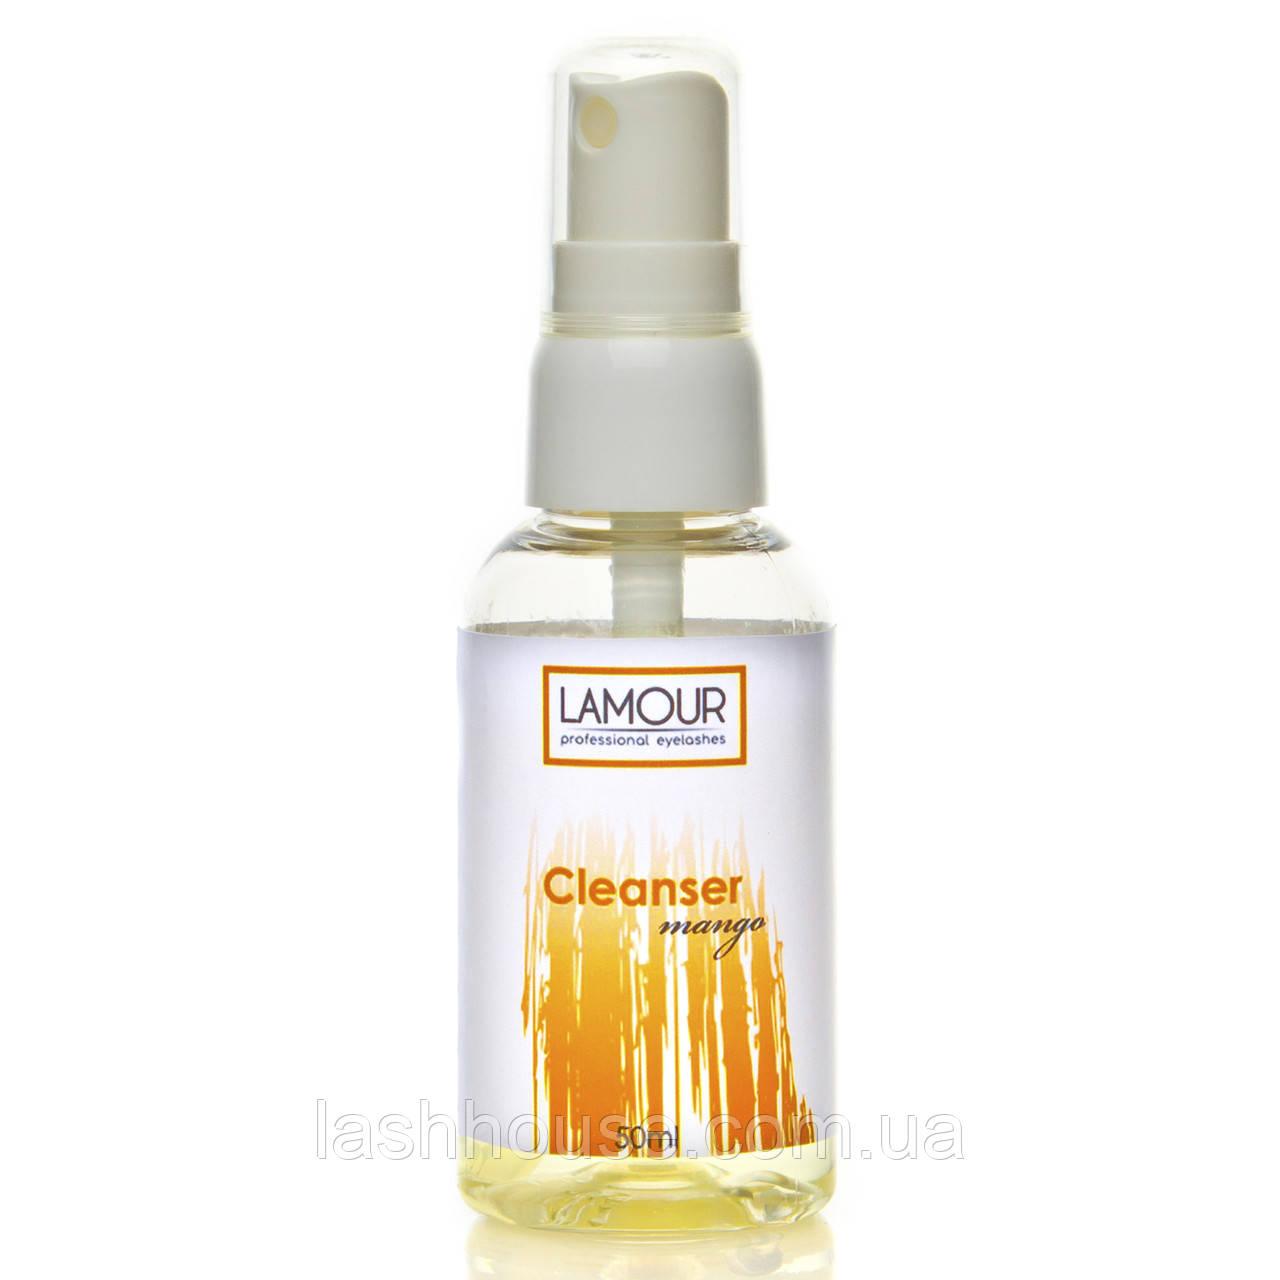 Обезжириватель для ресниц Lamour (Cleanser) 50 мл